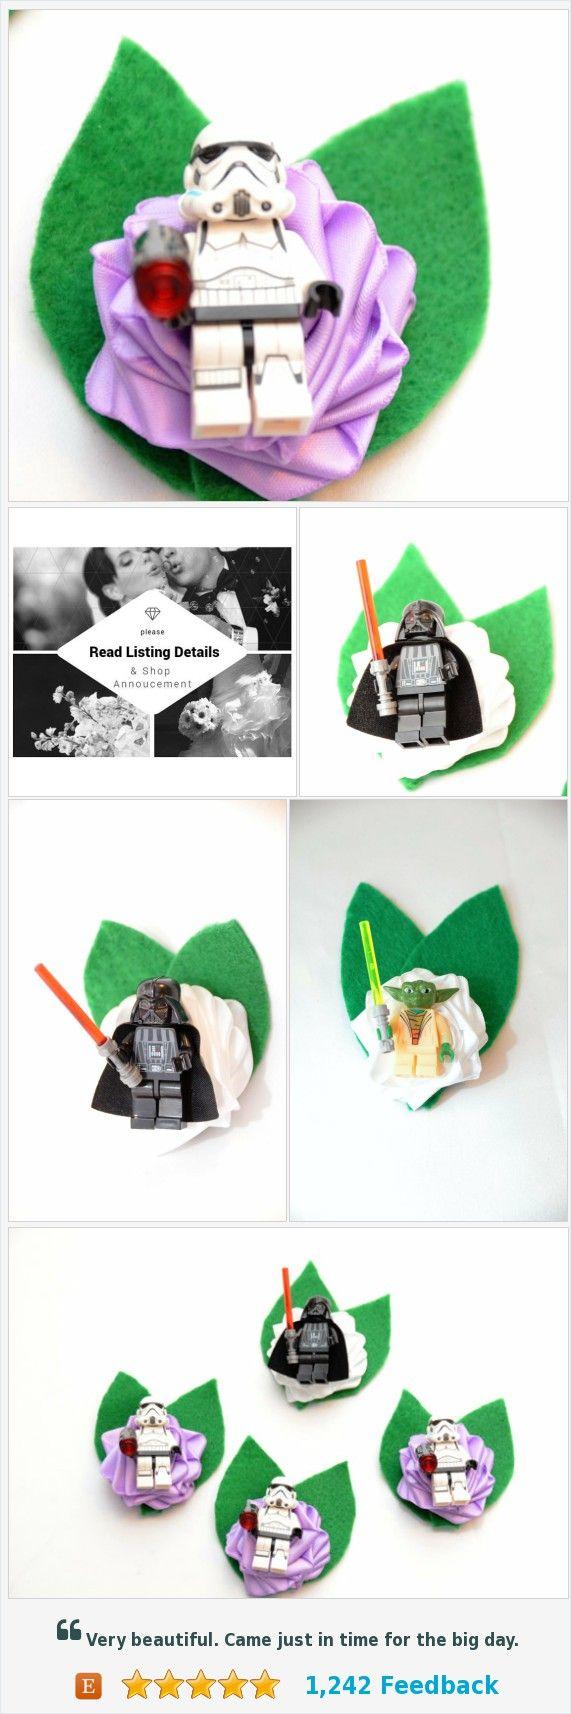 Wedding Geek Nerd Brick Style Boutonniere ~ Star Wars ~ Darth Vader ~ Luke Skywalker ~ Han Solo ~ Yoda ~ Sith Lords https://www.etsy.com/DivinityBraid/listing/486184518/wedding-geek-nerd-brick-style?ref=shop_home_active_2